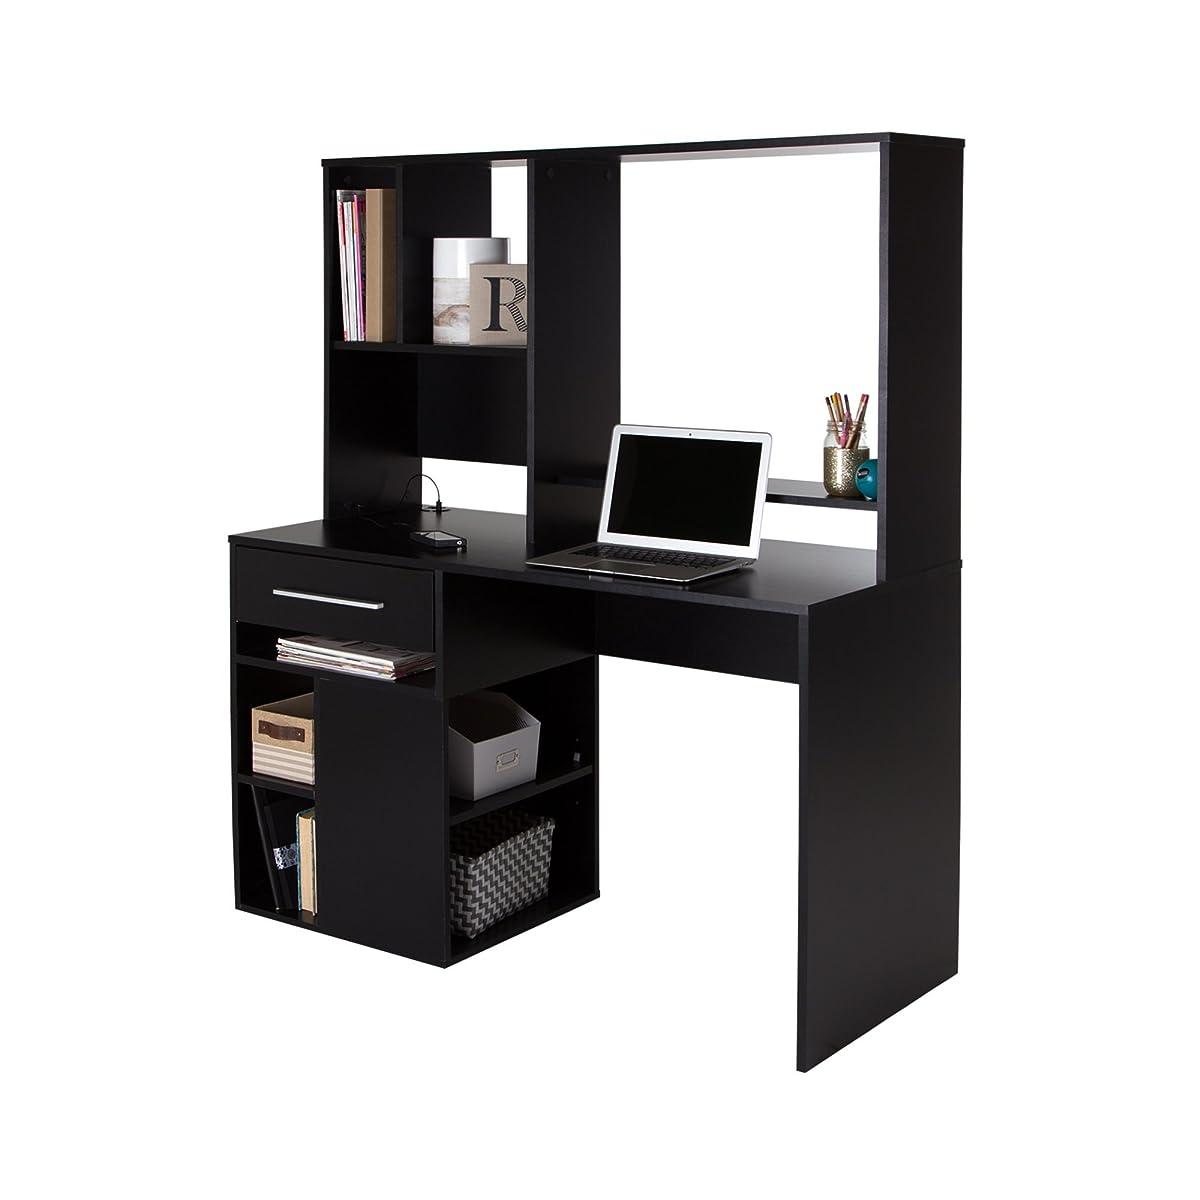 South Shore Annexe Home Office Computer Desk, Pure Black